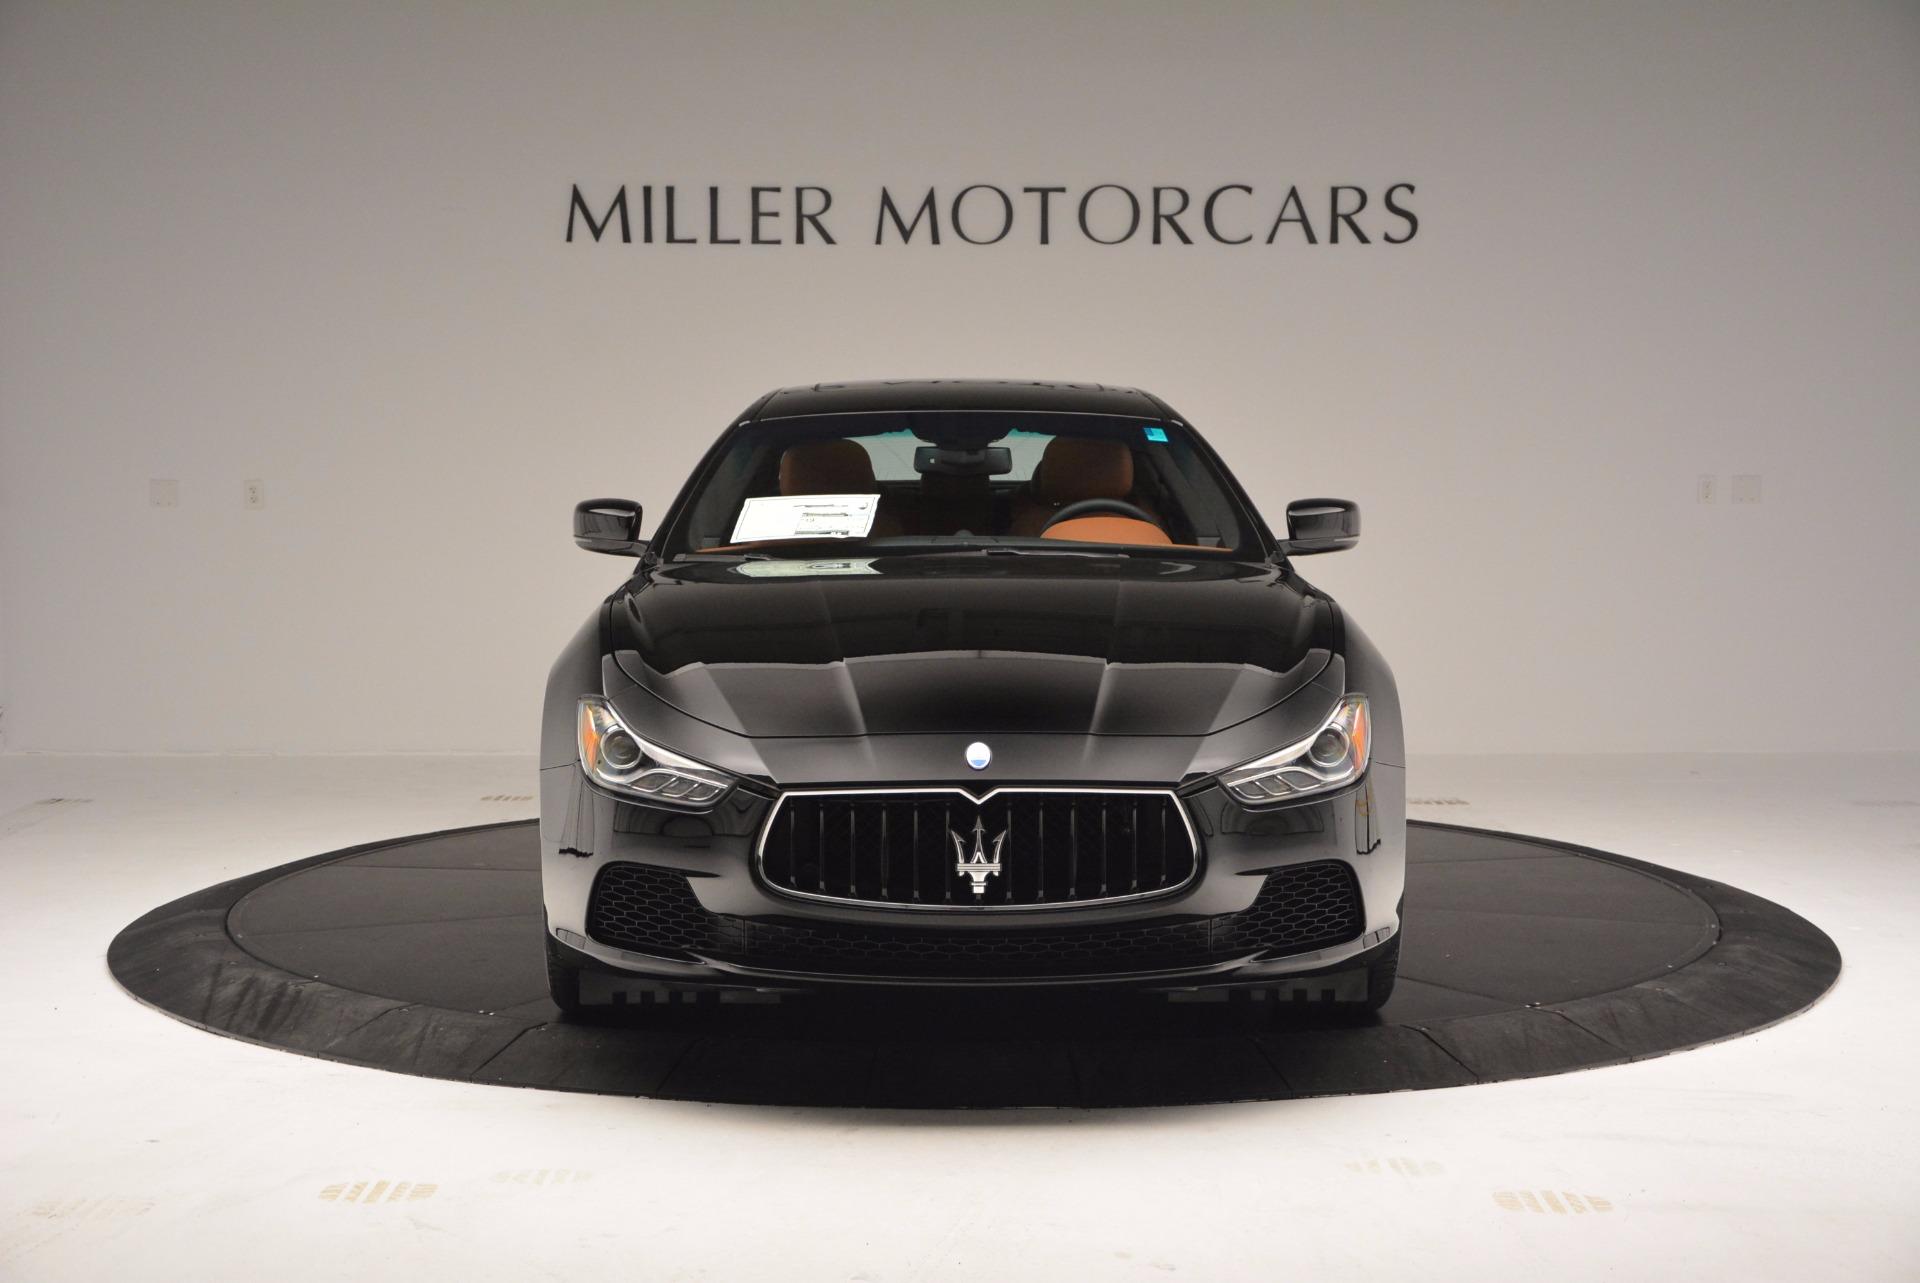 New 2017 Maserati Ghibli S Q4 EX-LOANER For Sale In Greenwich, CT 1115_p12